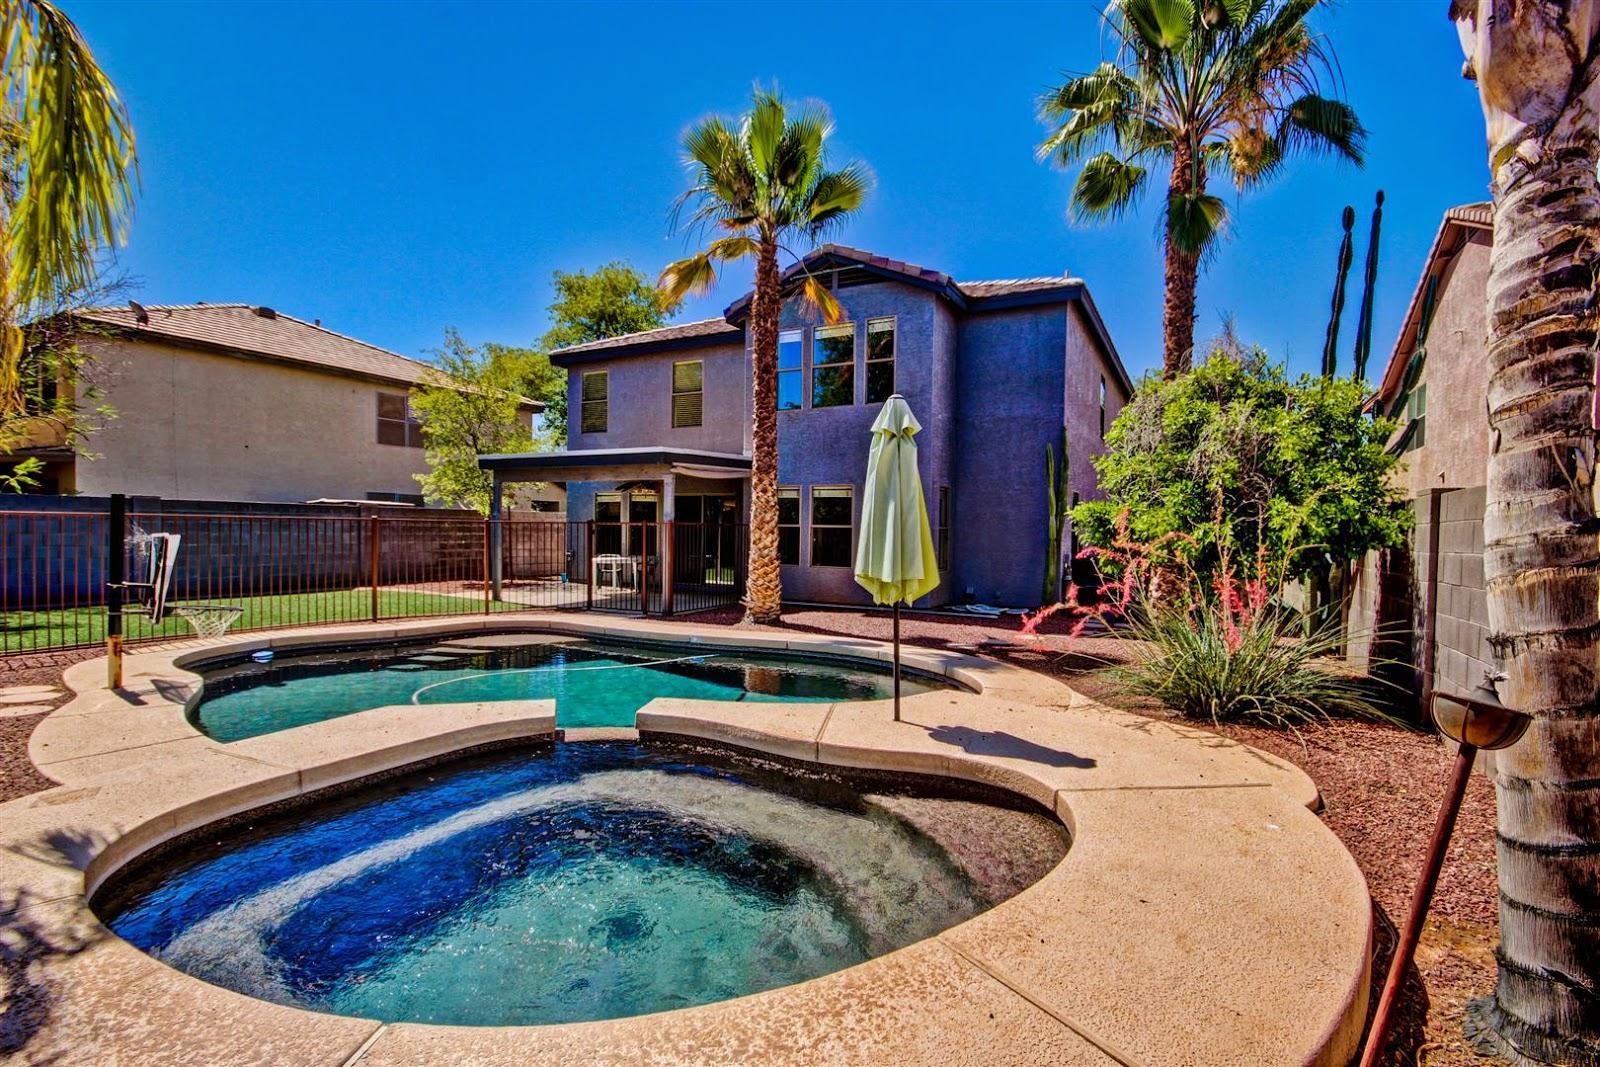 http://www.anyazhome.com/Property/434-W-Midland-Ln-Gilbert-Arizona